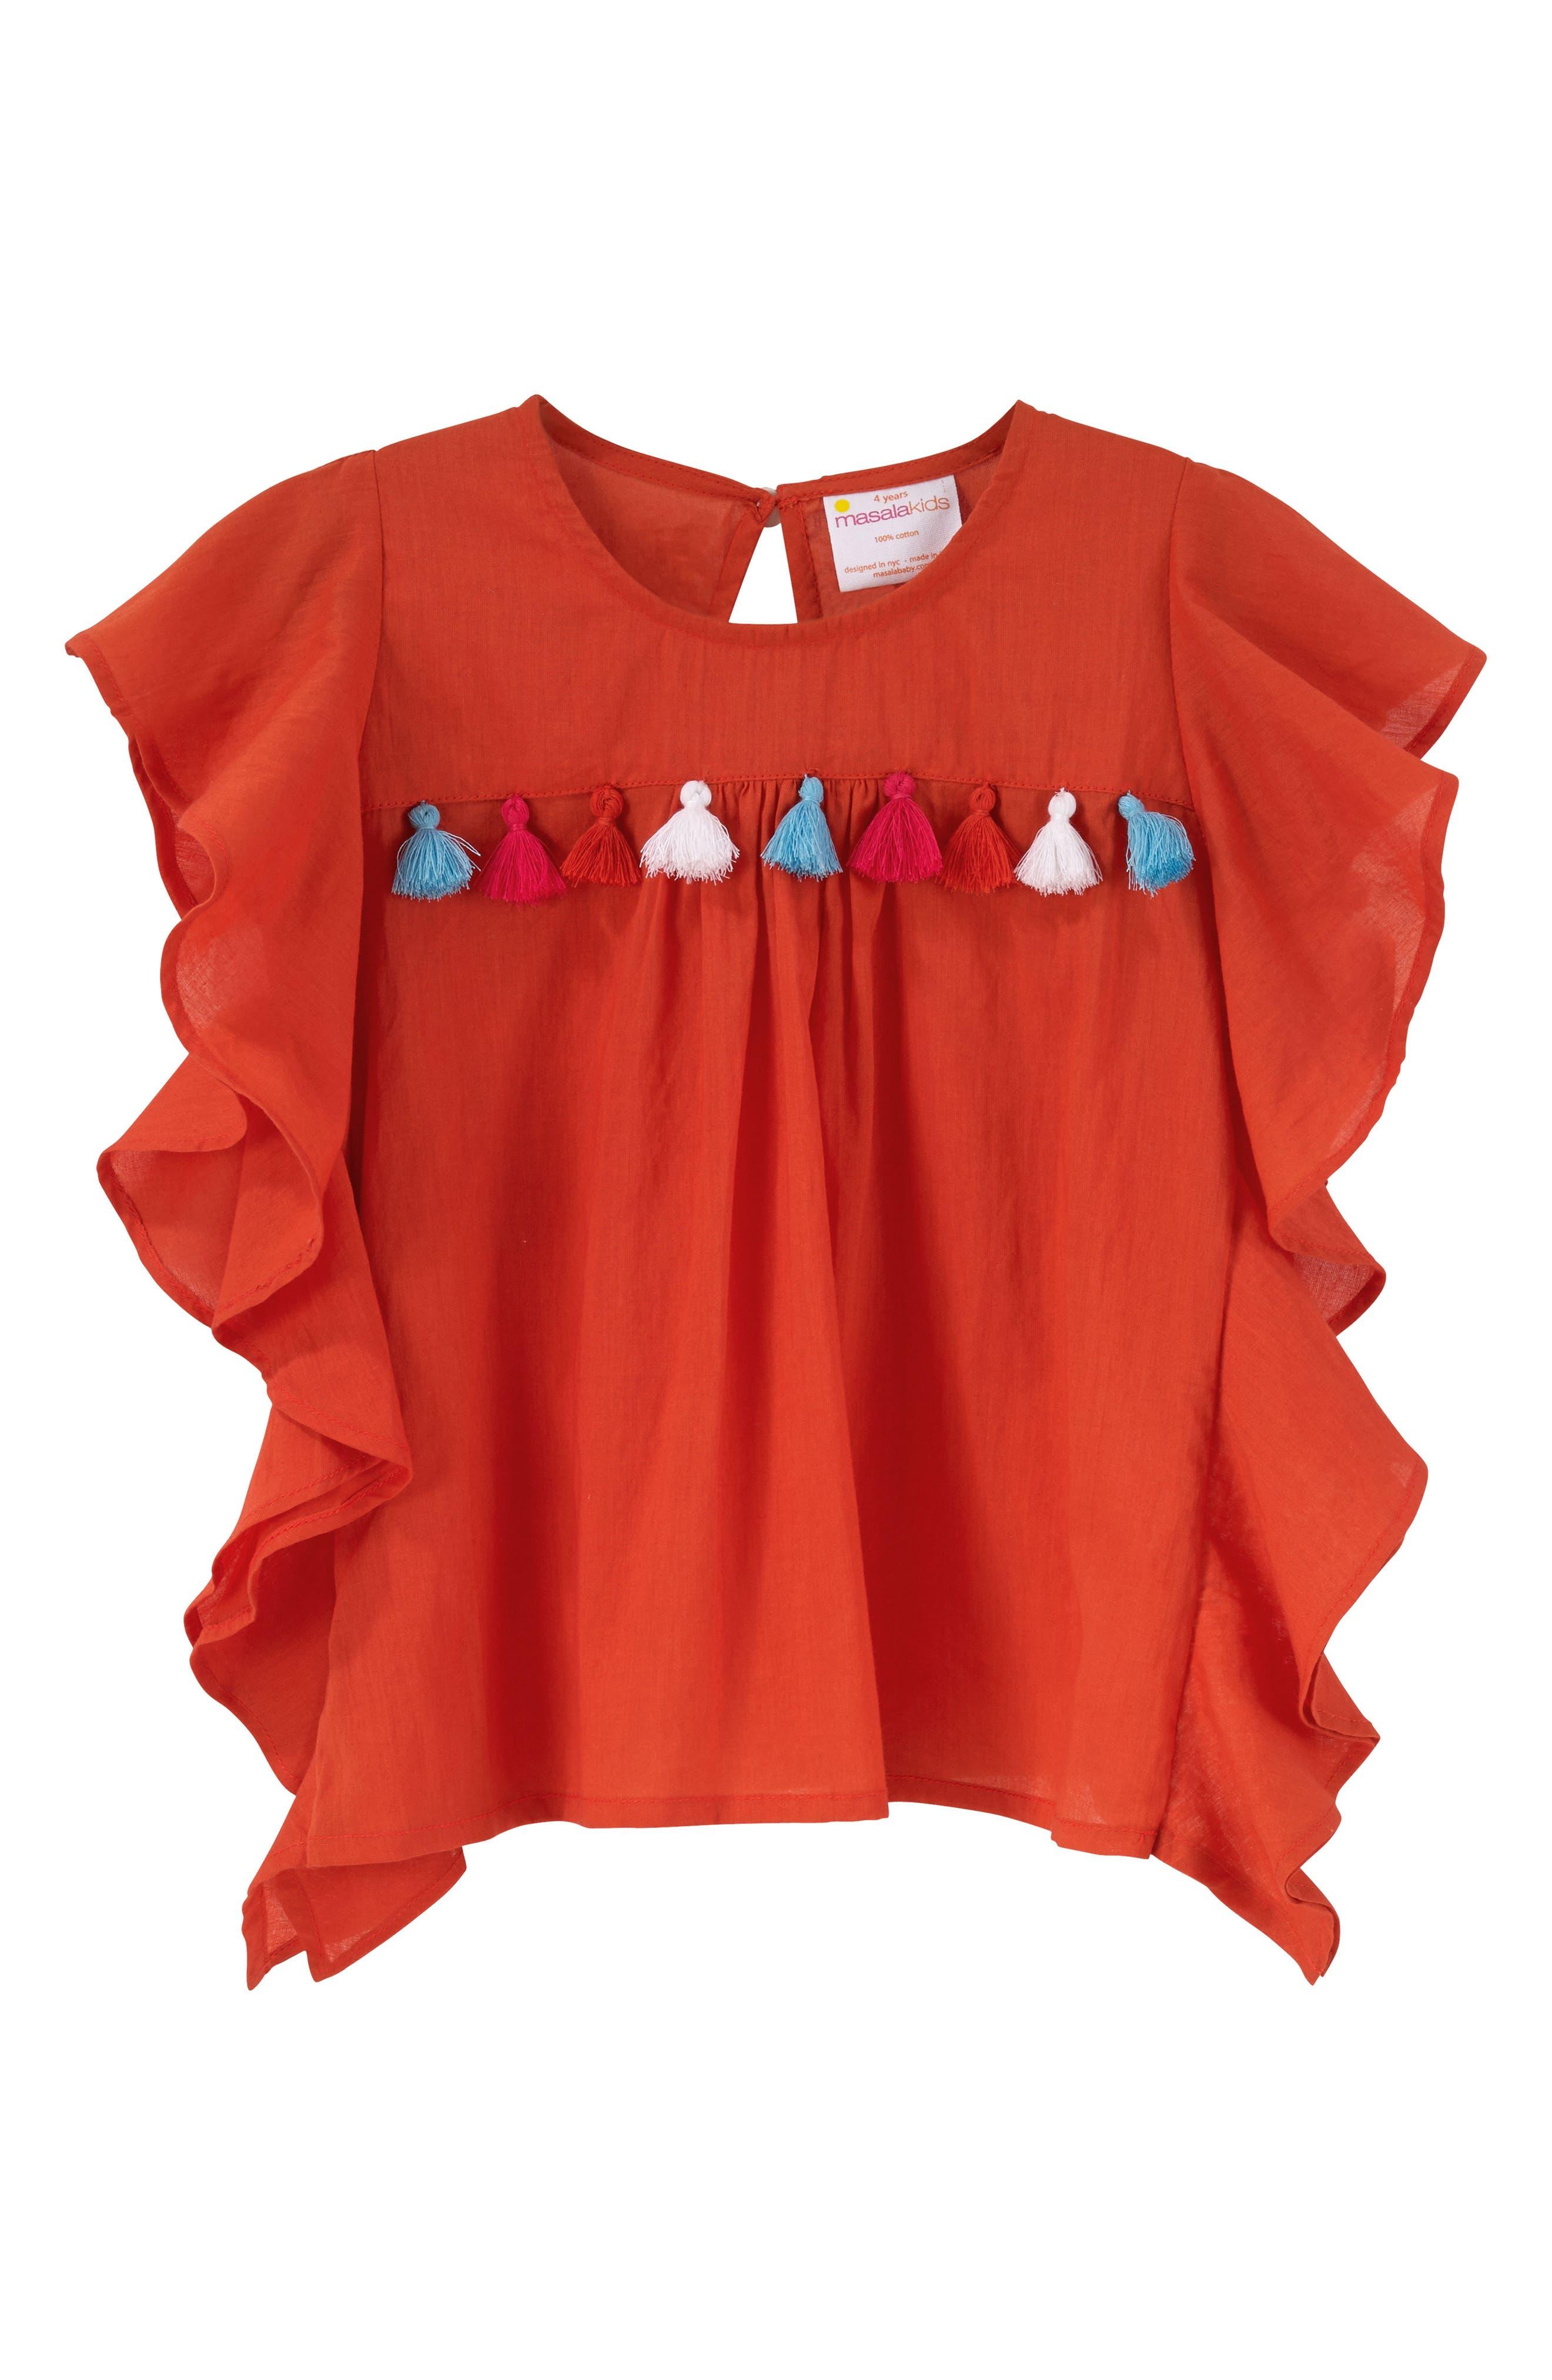 Alternate Image 1 Selected - Masalababy Wave Ruffle Top (Toddler Girls, Little Girls & Big Girls)